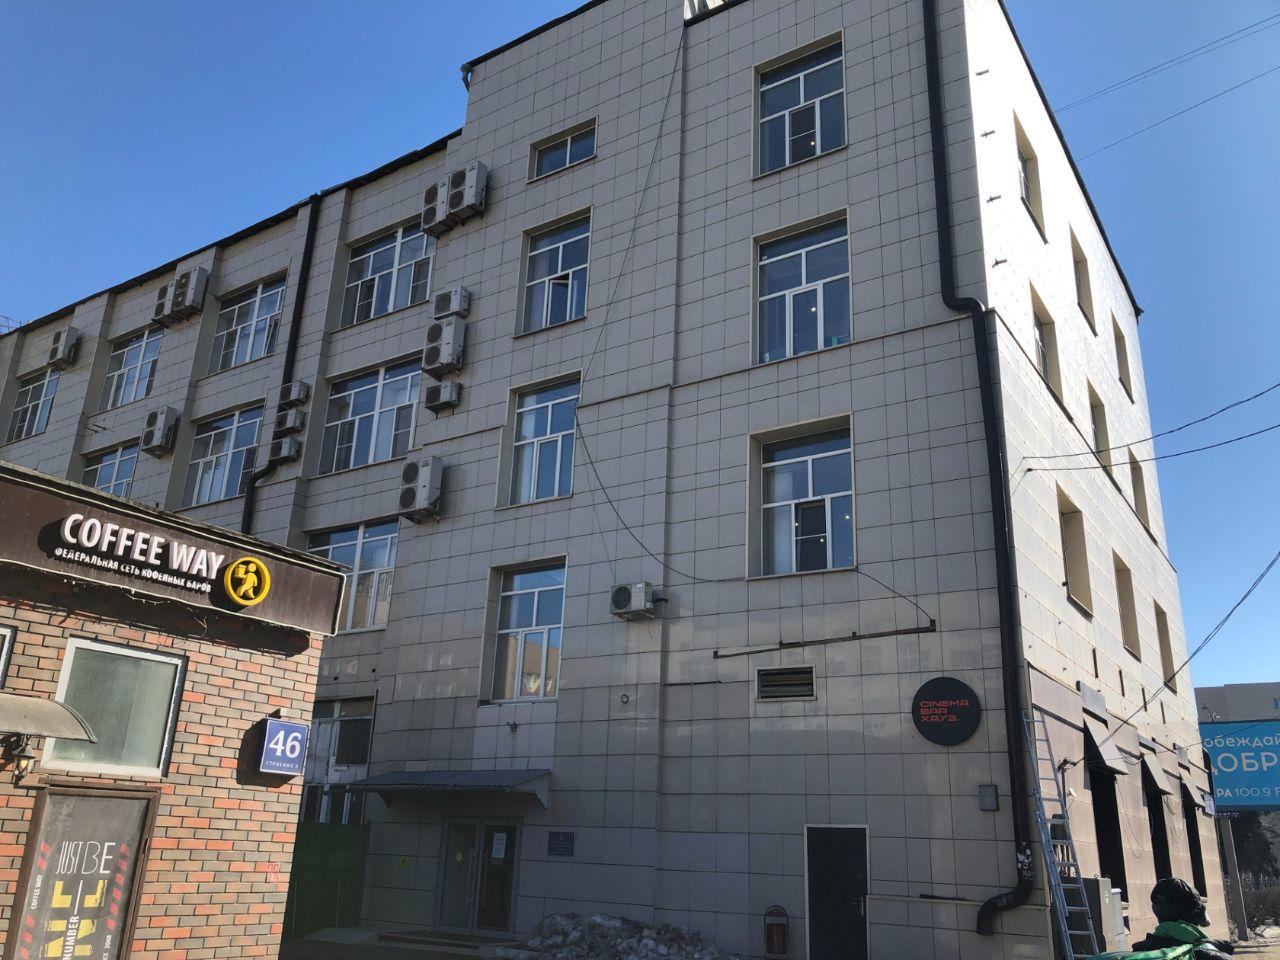 БЦ на ул. Бутырская, 46с1